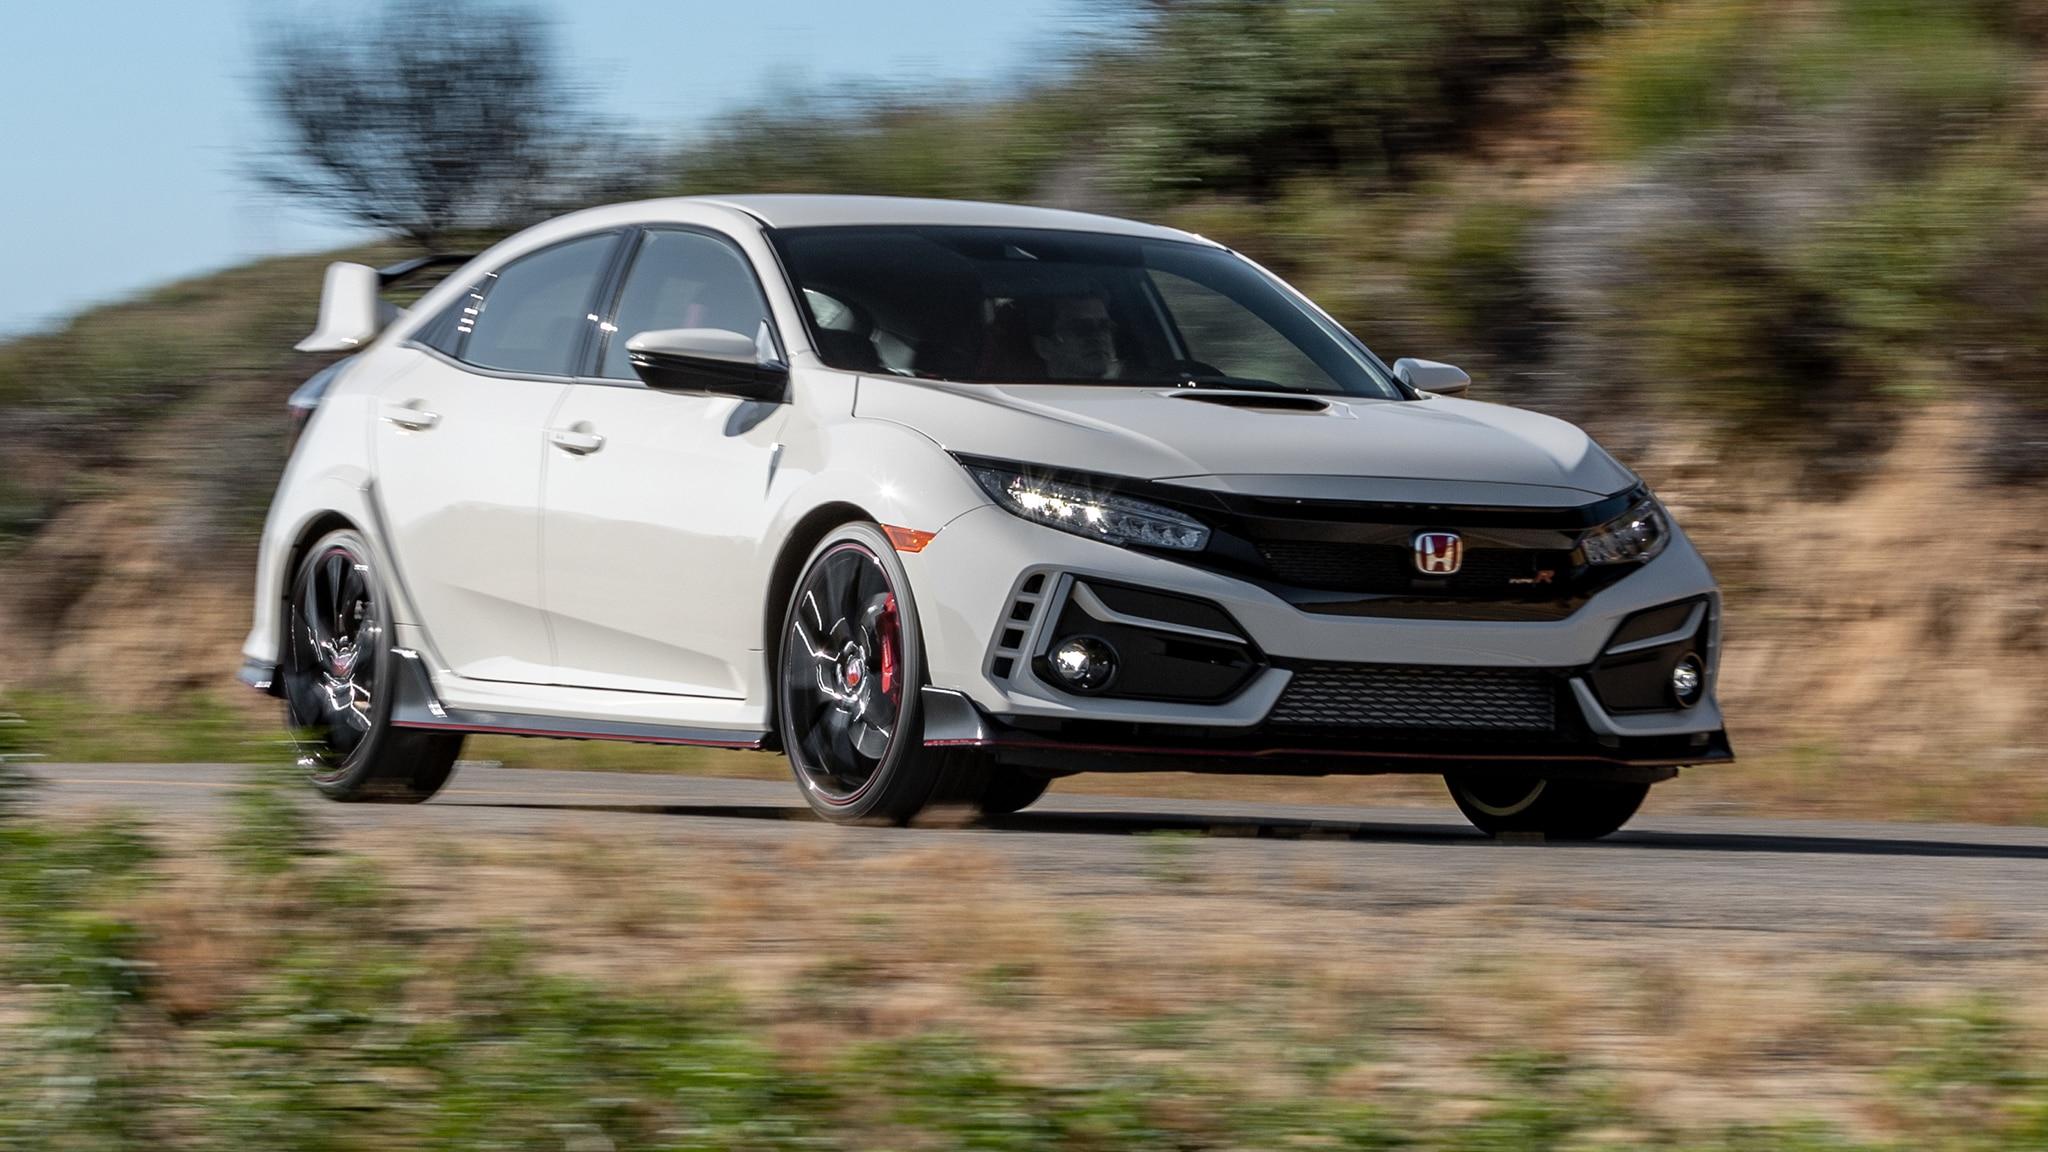 Kekurangan Honda Civic Typer Spesifikasi